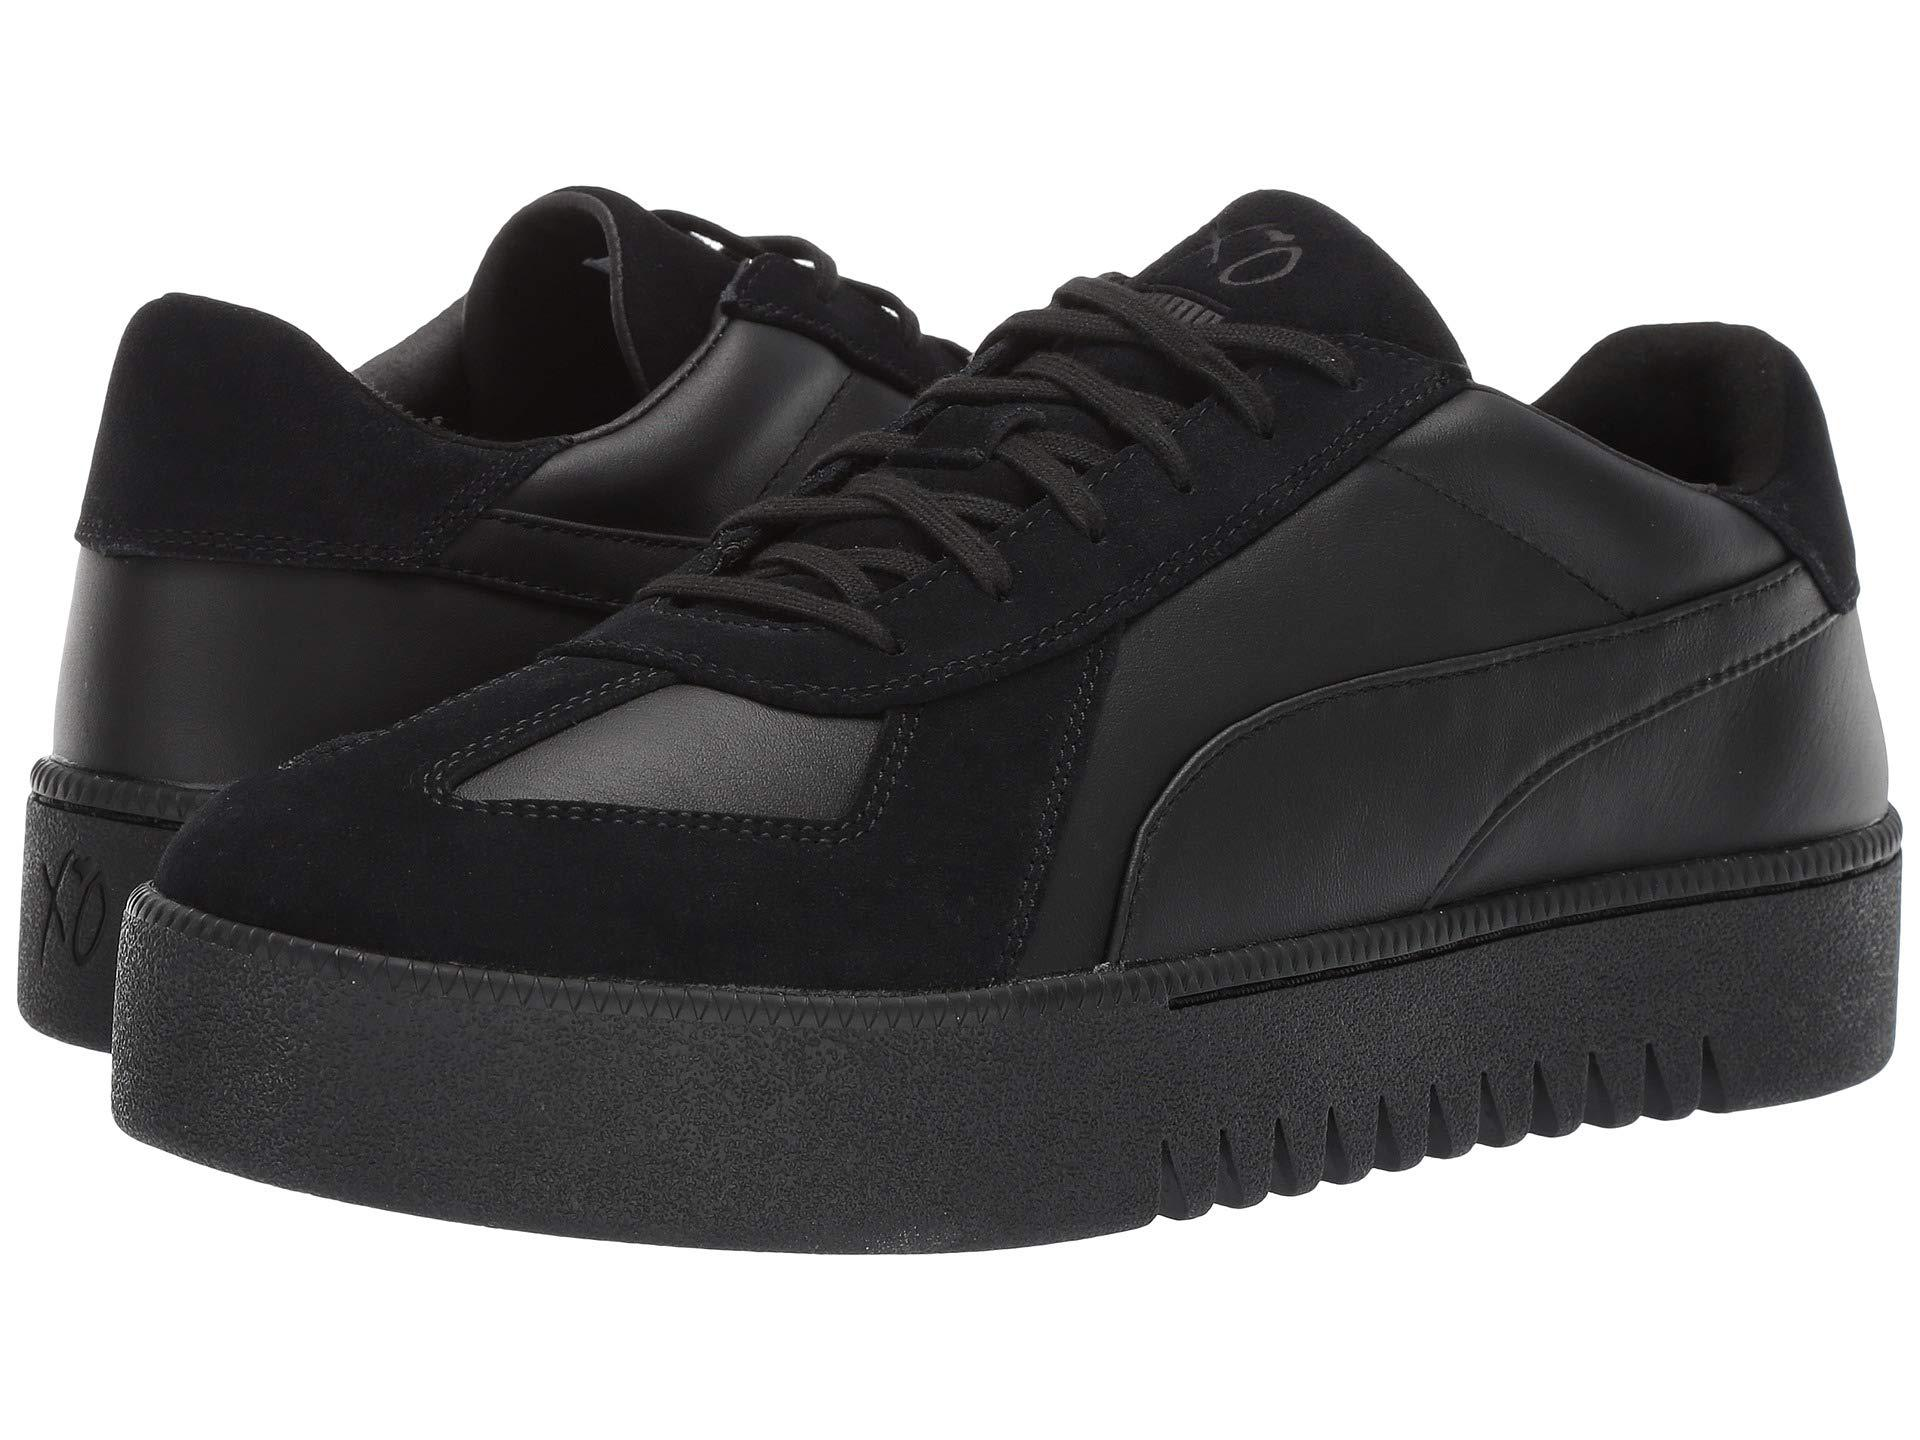 Lyst - PUMA X Xo Terrains ( Black) Men s Shoes in Black for Men d9f11f1d3